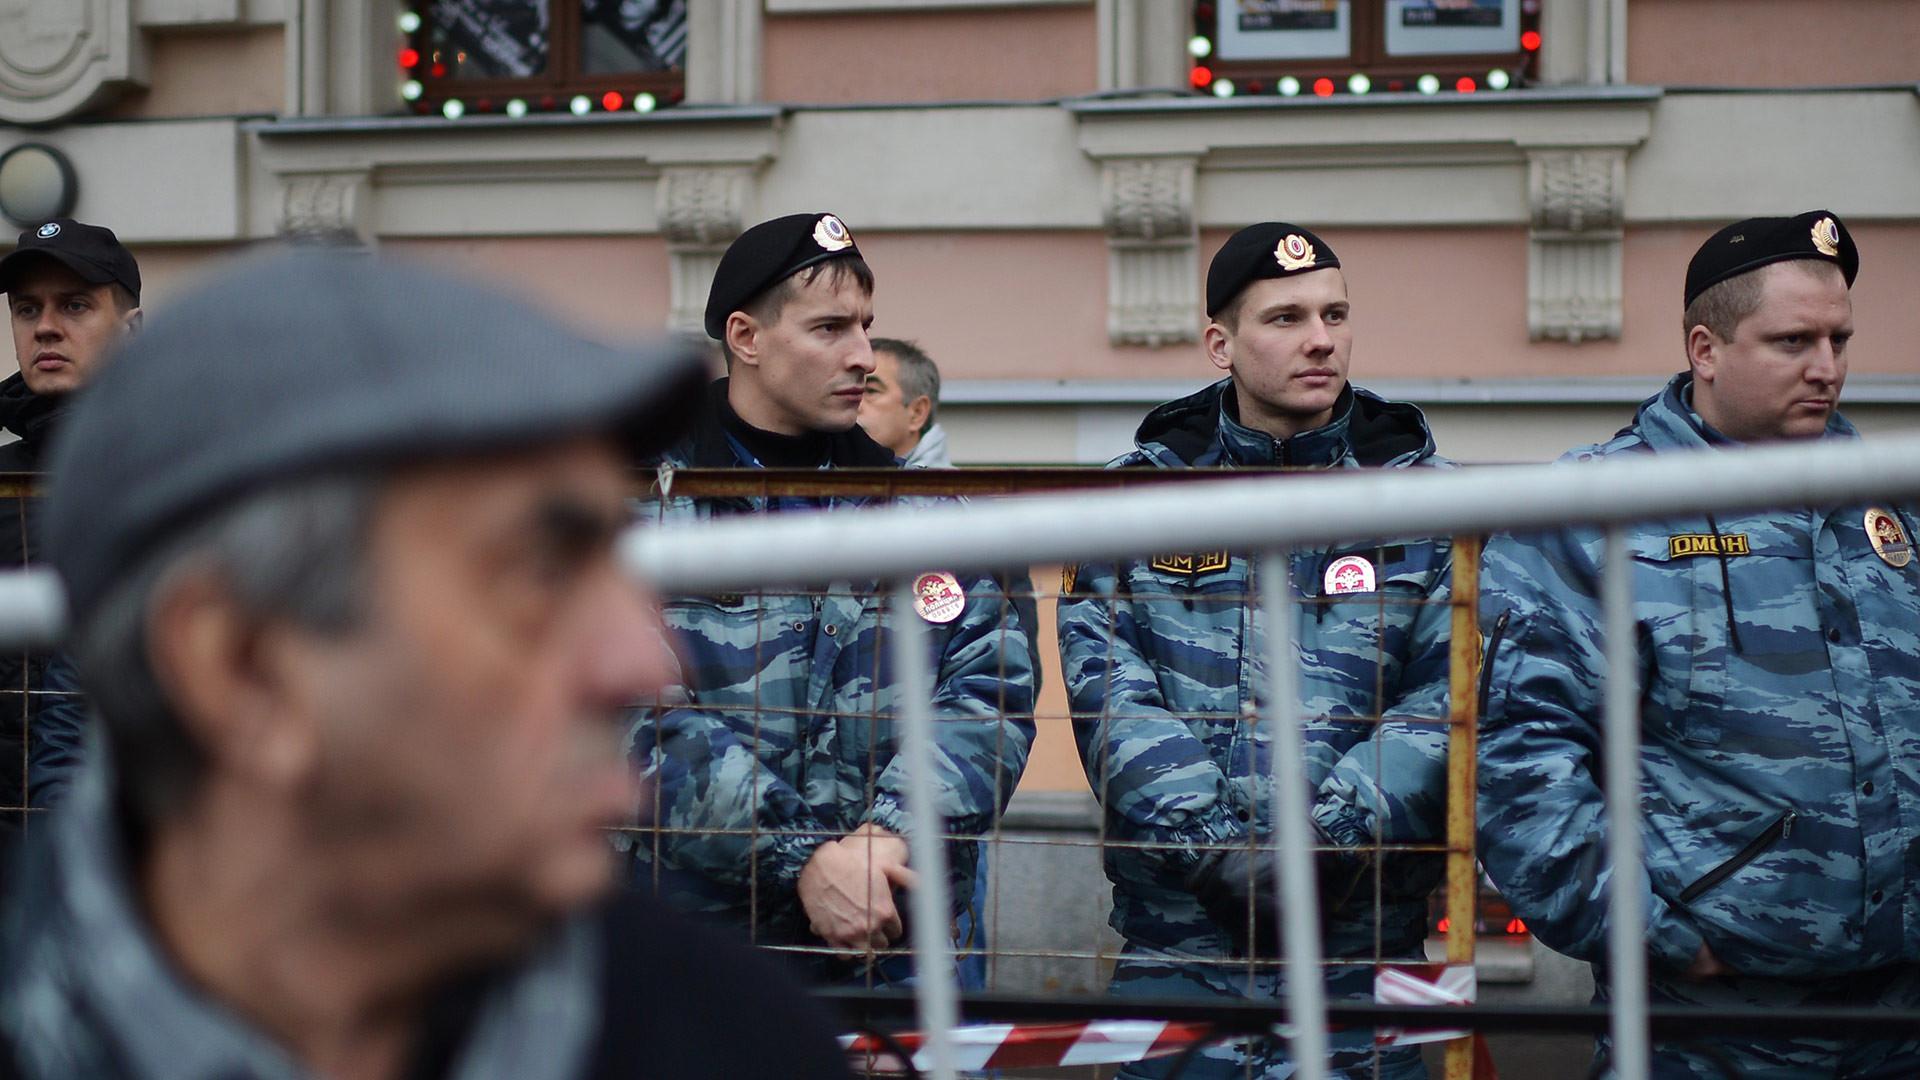 <p>Фото &copy; РИА Новости/Рамиль Ситдиков</p>